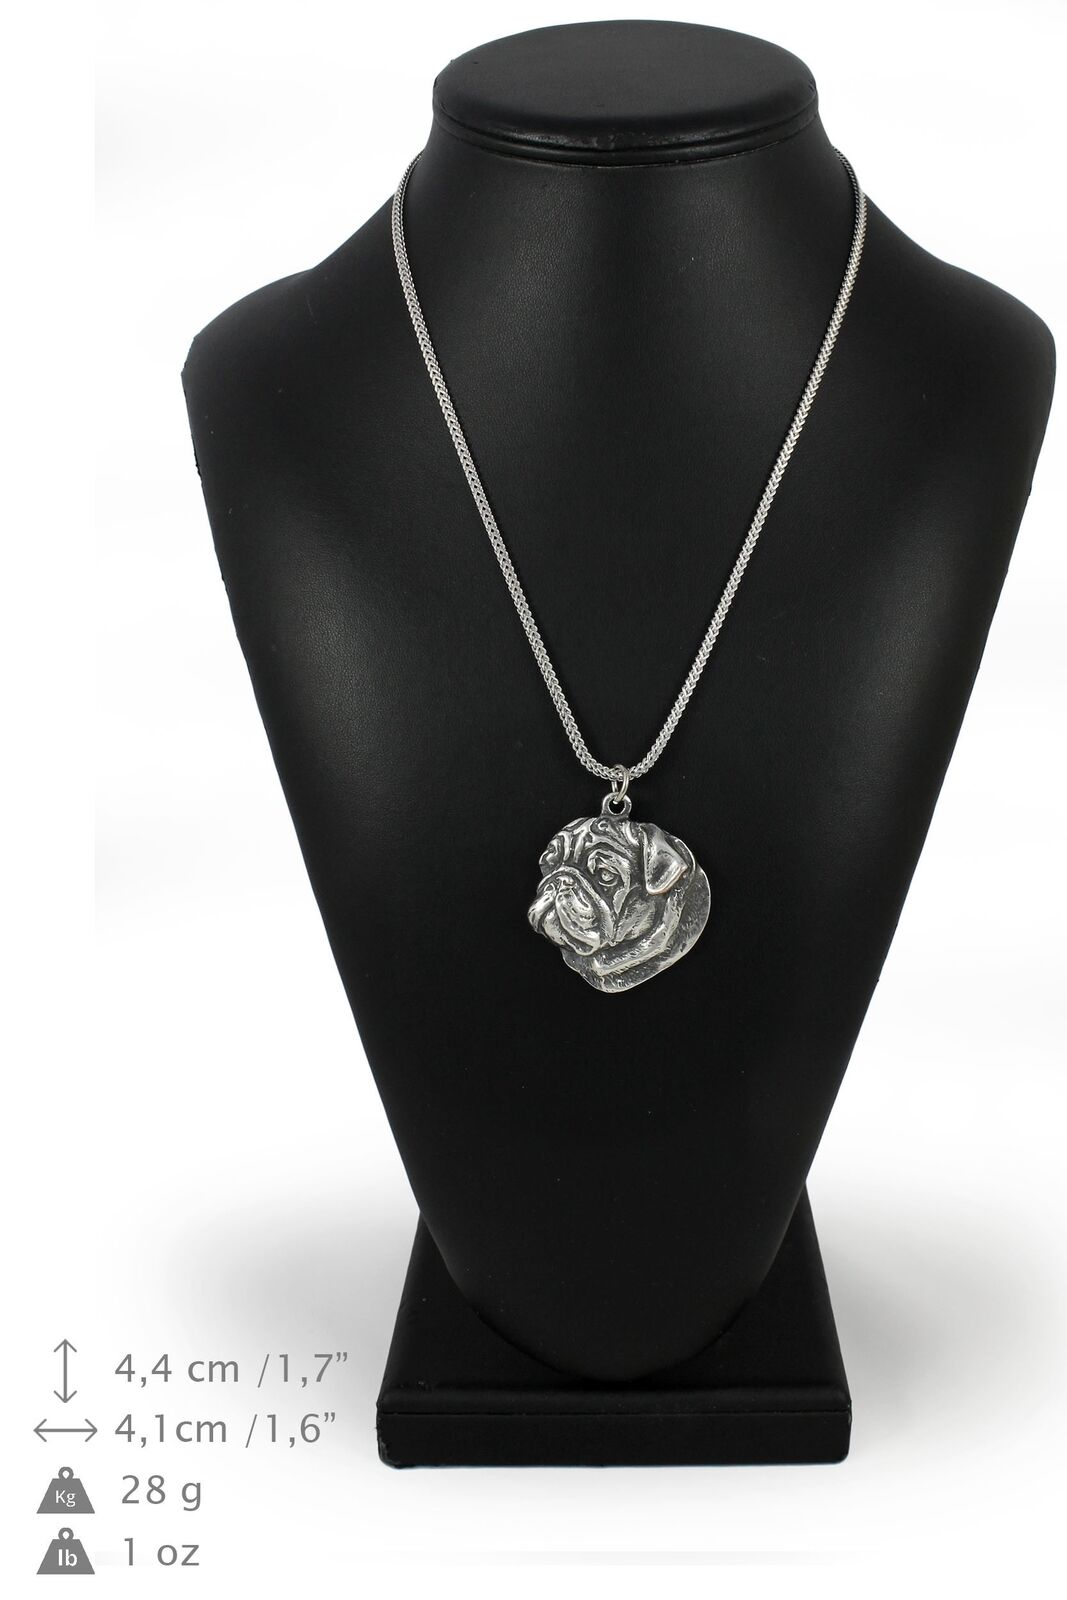 Carlin - collier en argento plaqué sur une chaîne en argento Art Dog FR